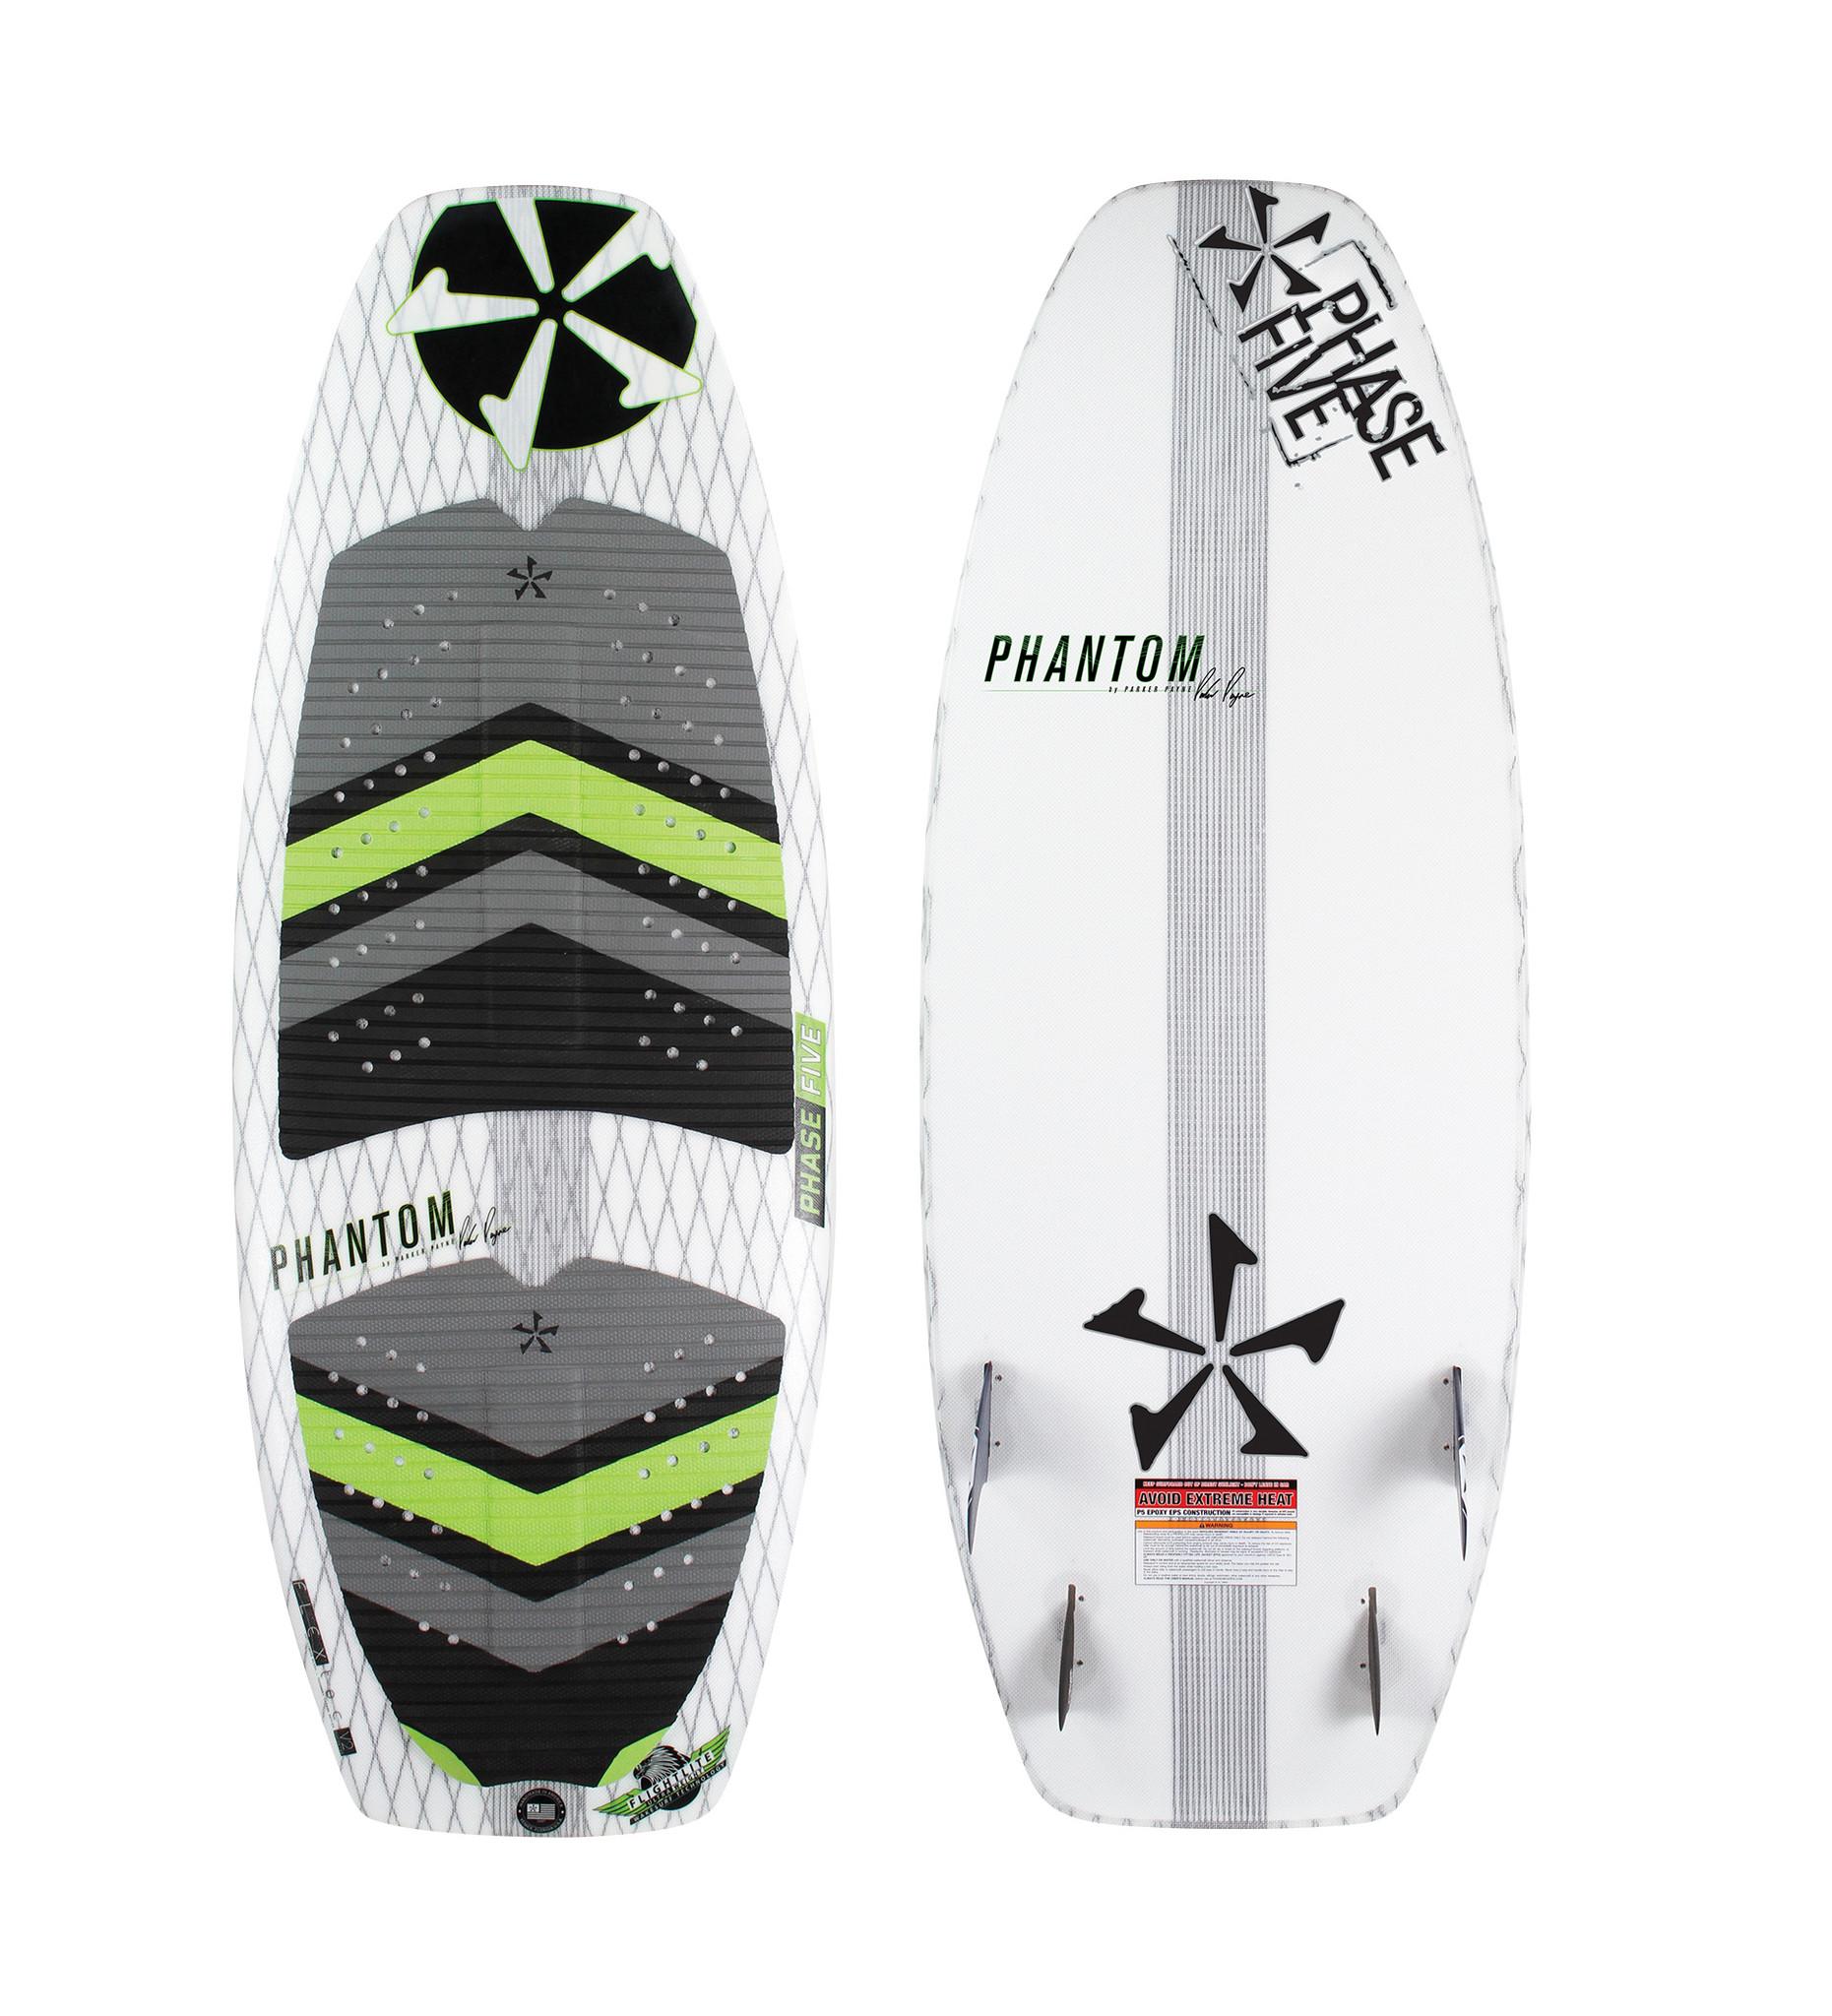 Phase Five Phantom Wake Surfboard